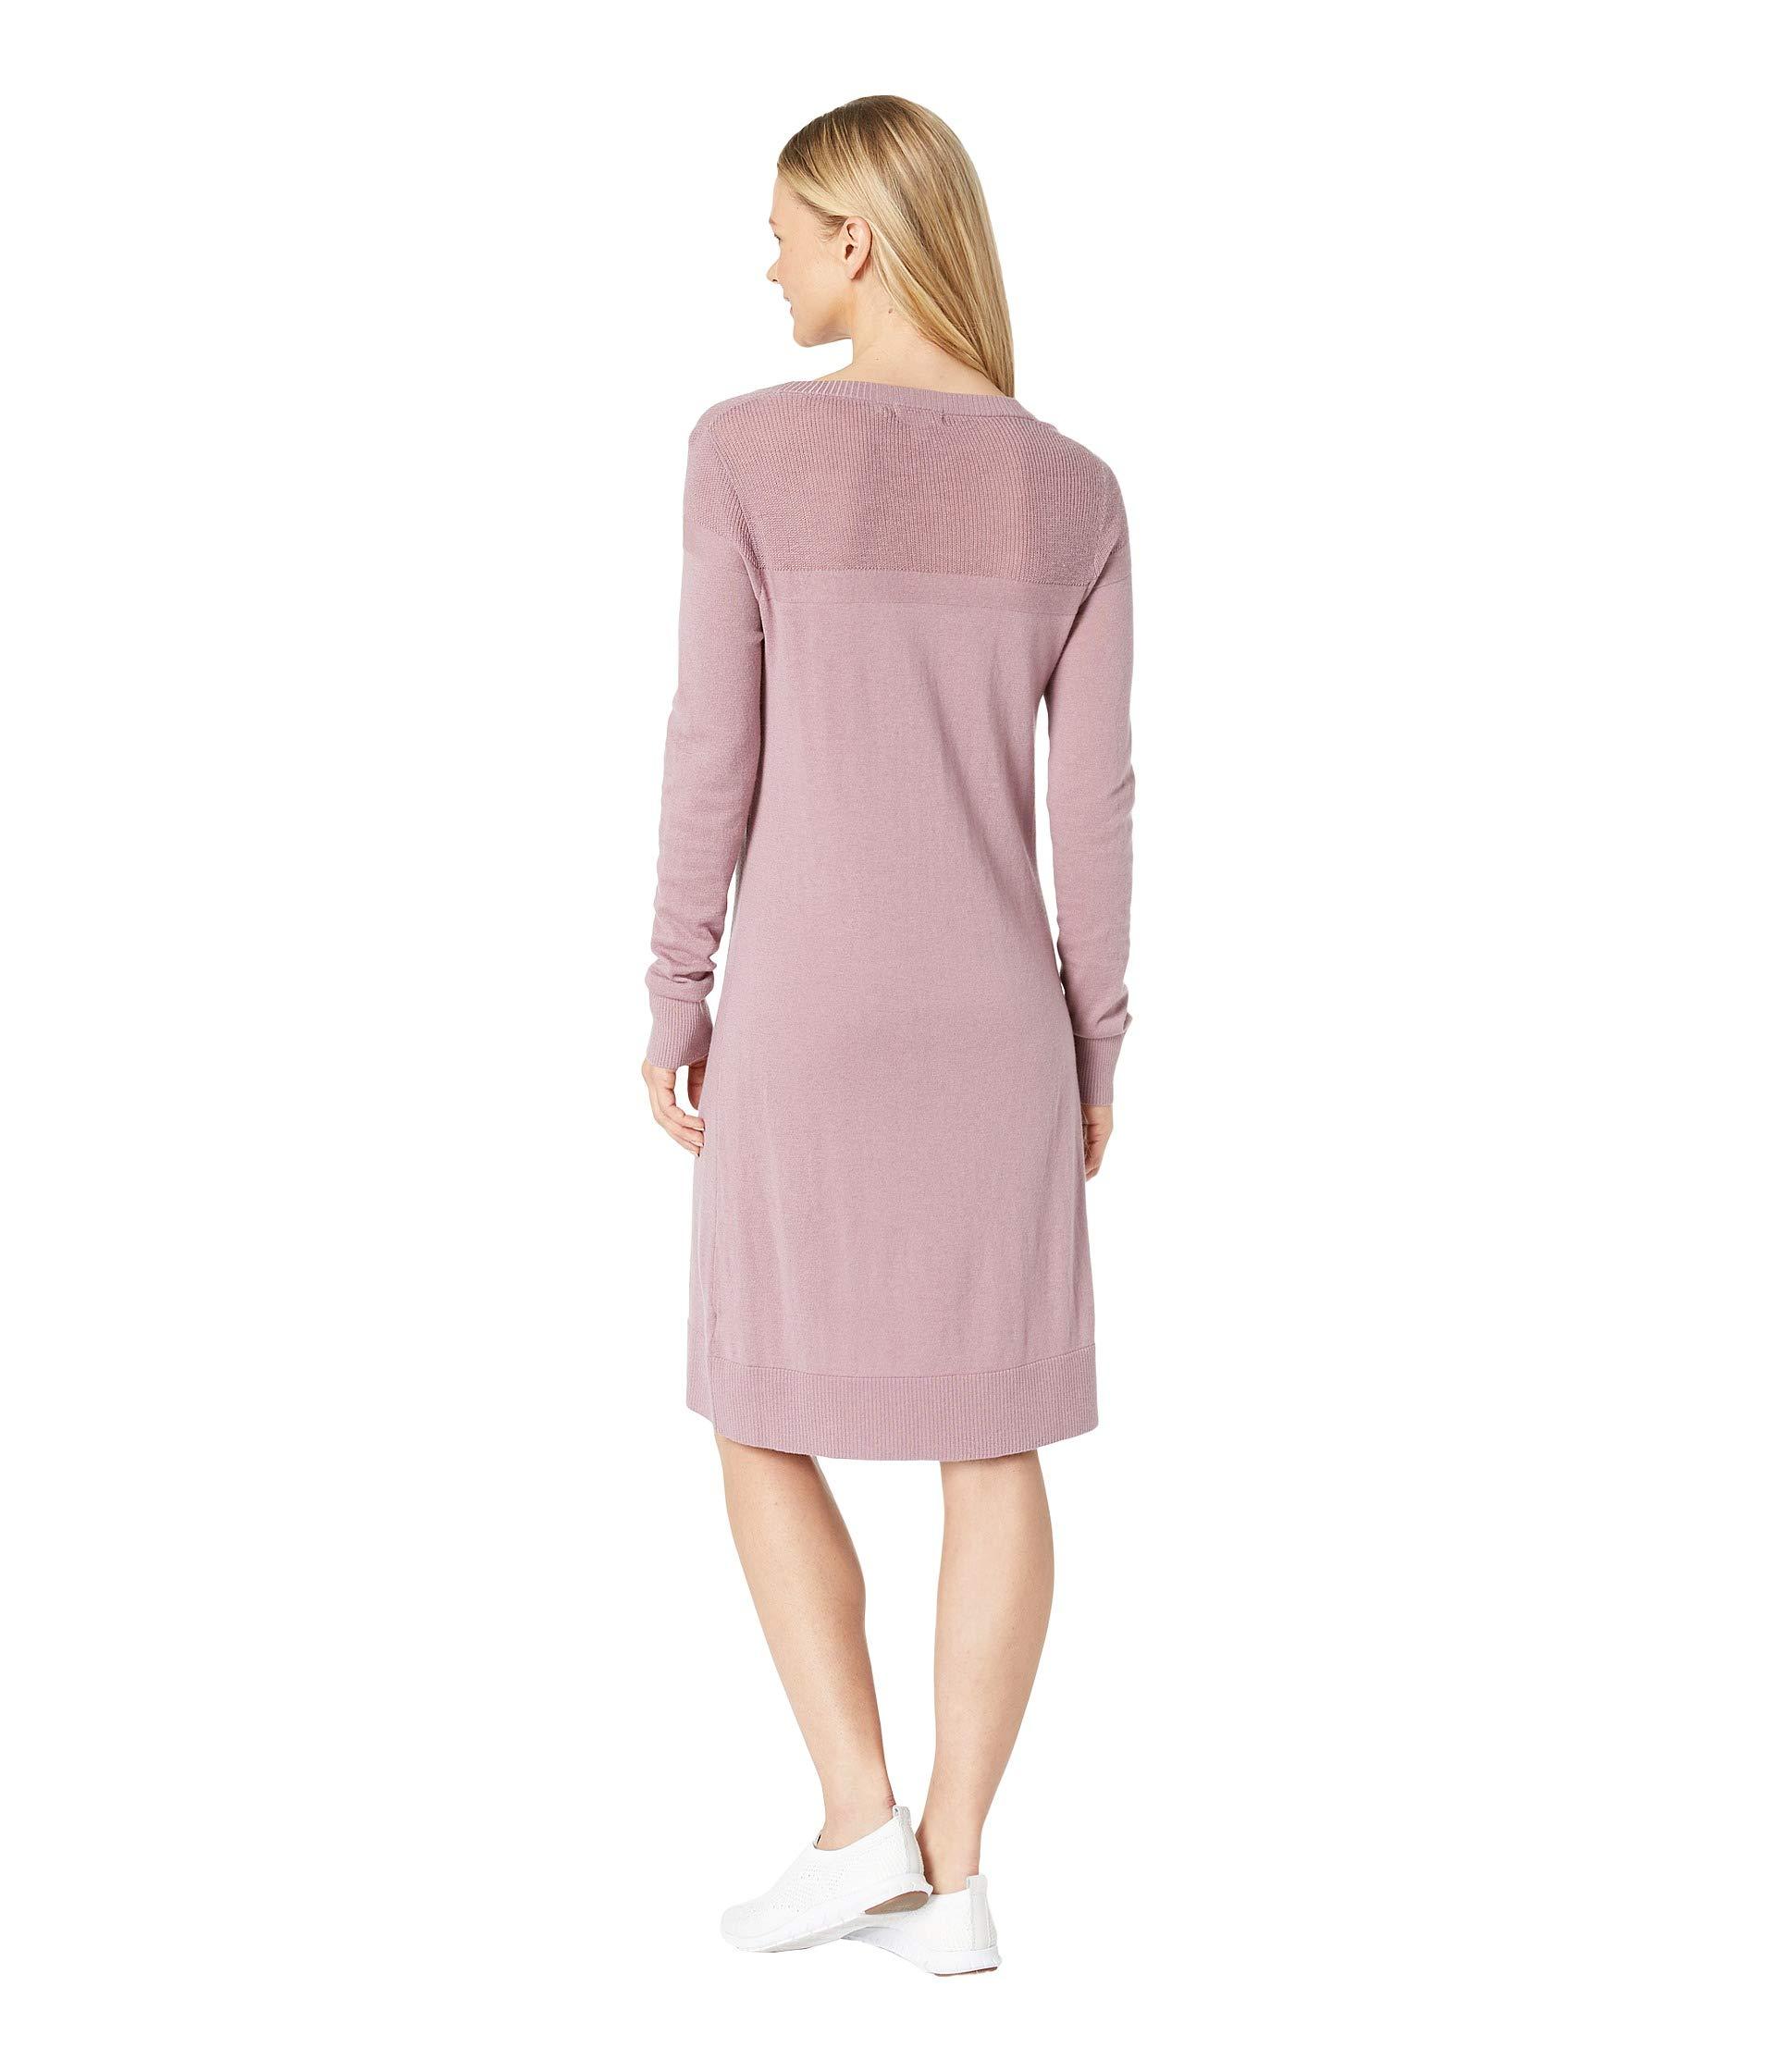 Dress Toad Mauve Sweater Cambria amp;co ARXYXxwq70